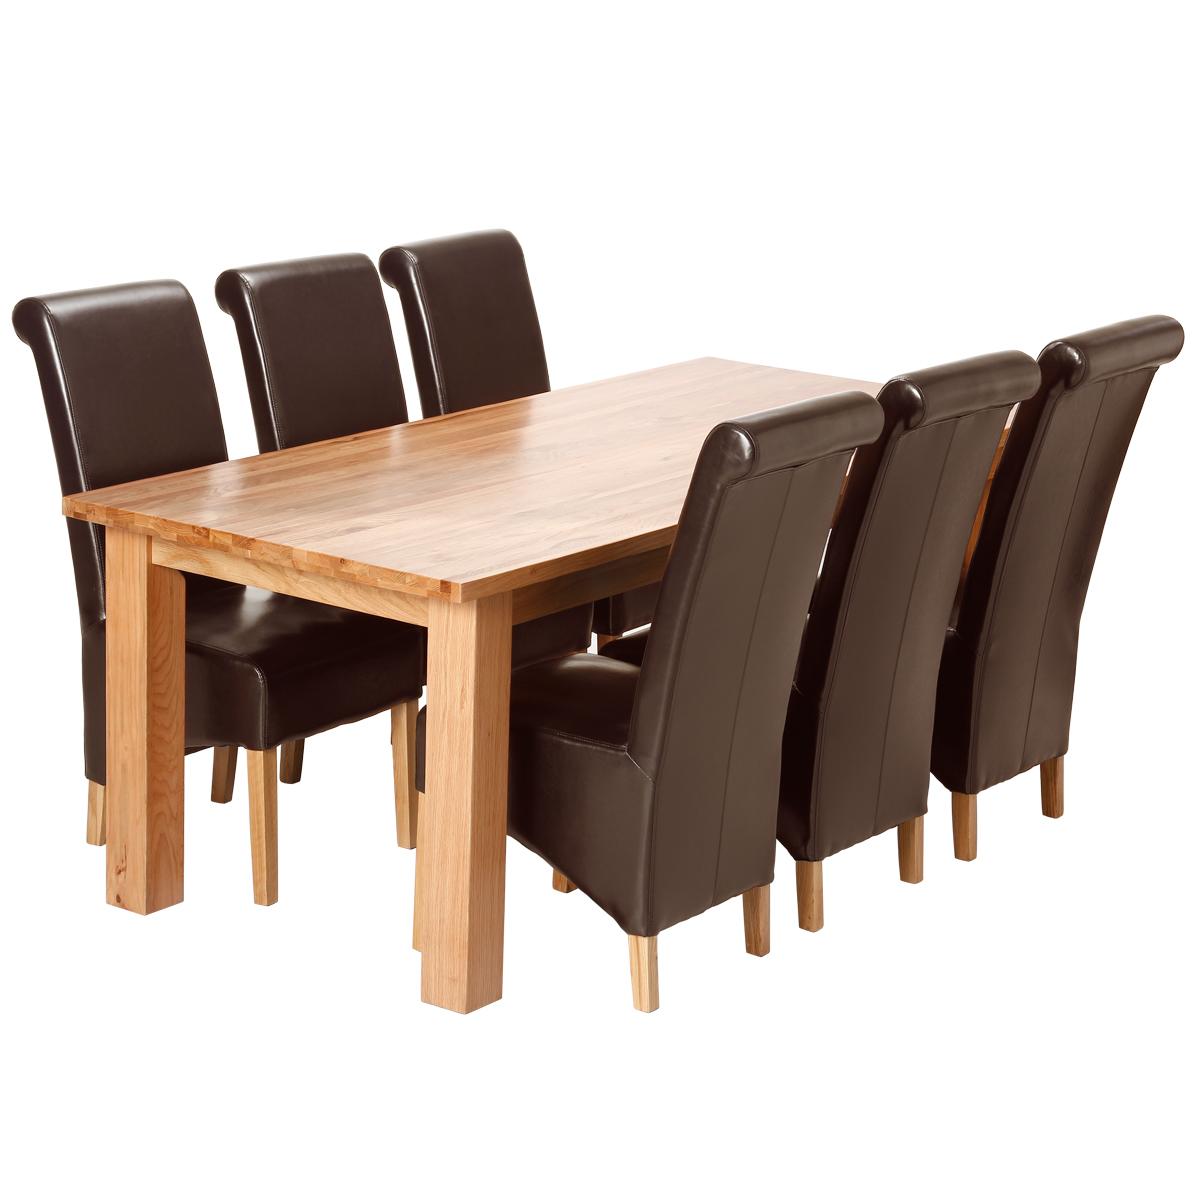 Solid oak kitchen chairs Photo - 10